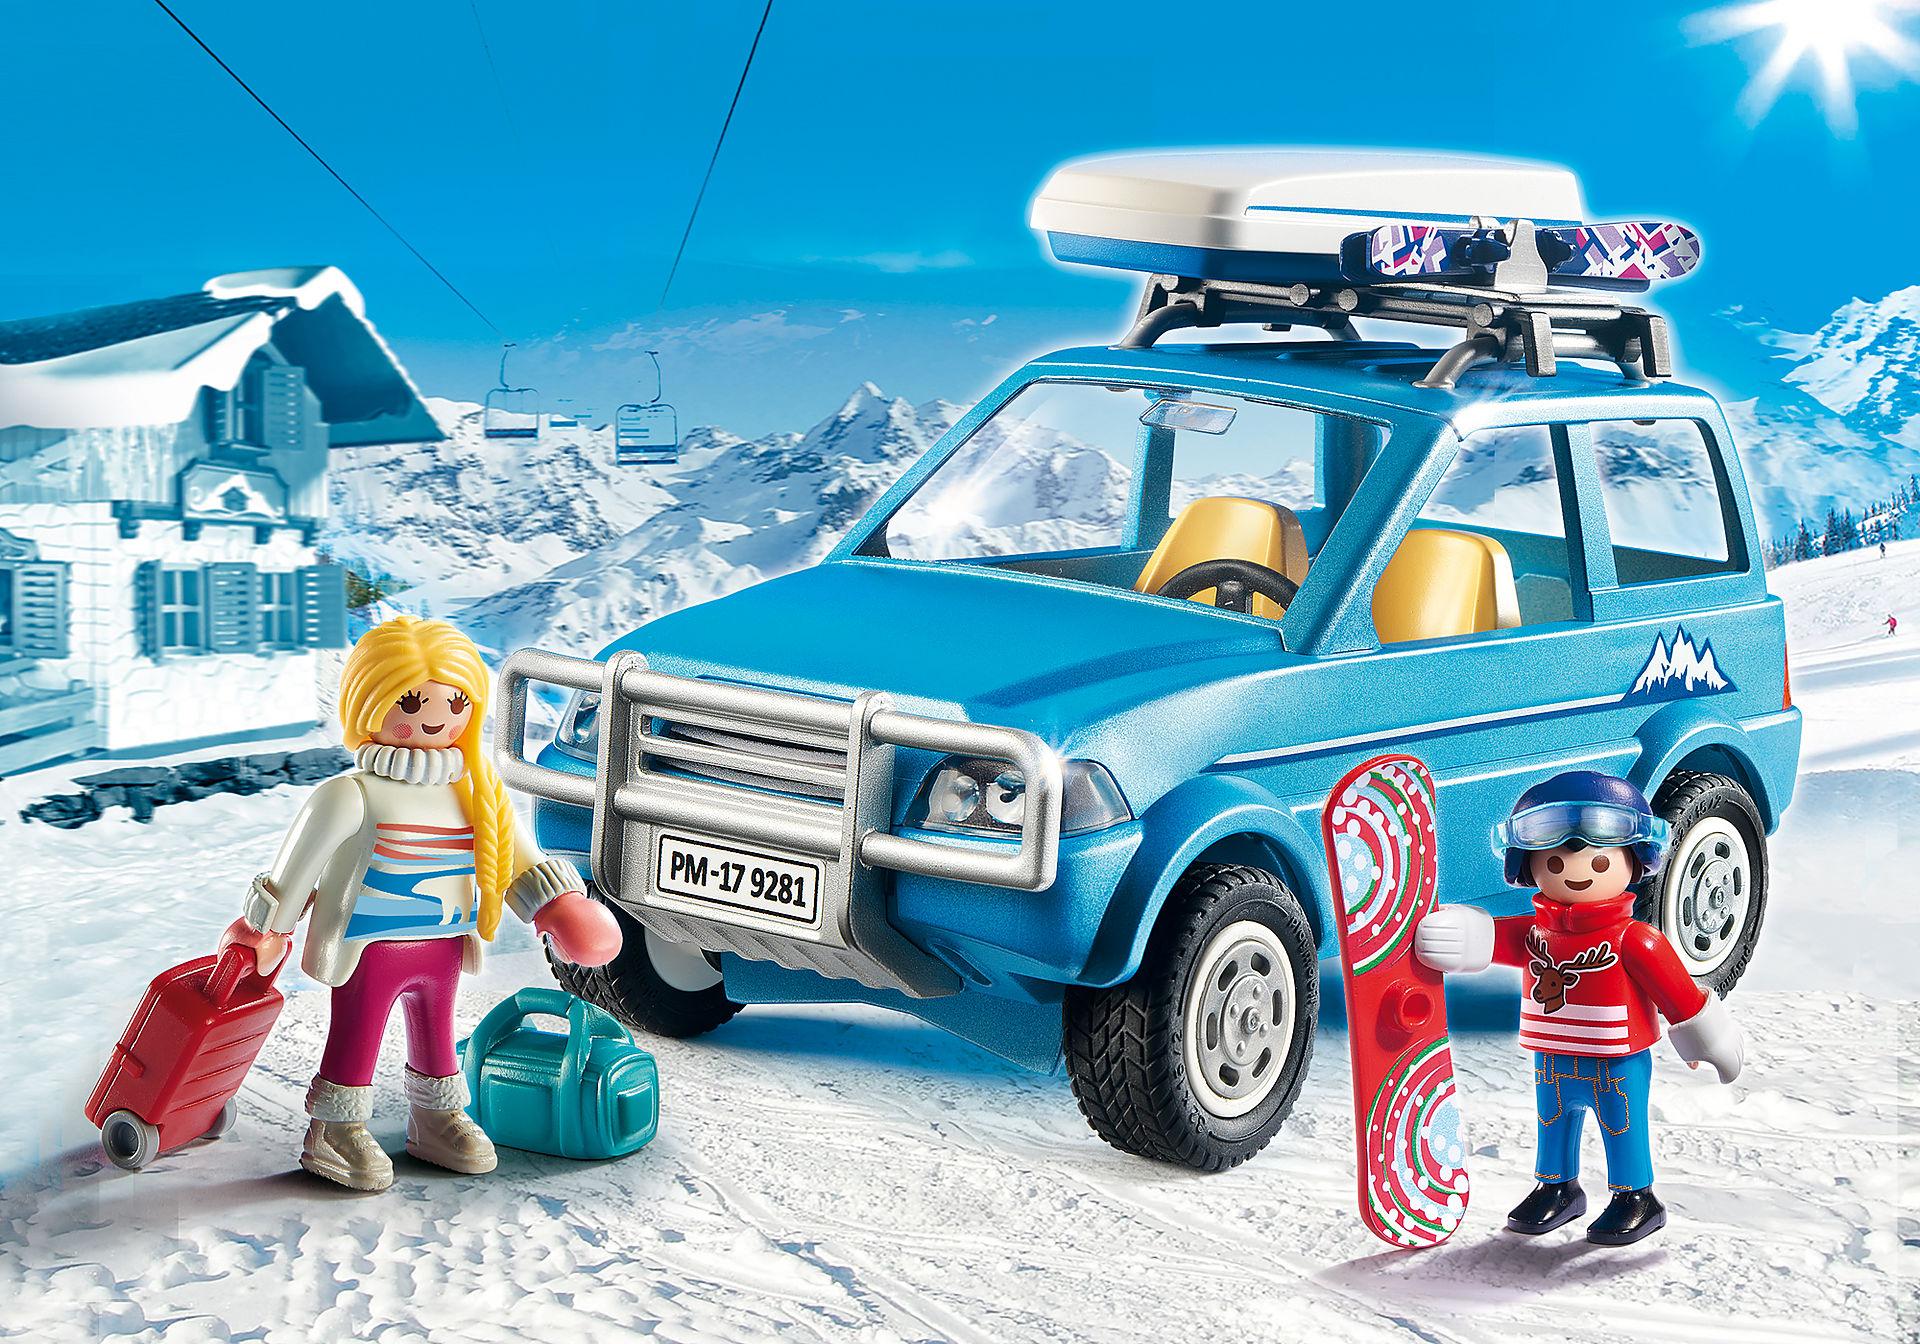 http://media.playmobil.com/i/playmobil/9281_product_detail/Όχημα 4x4 με μπαγκαζιέρα